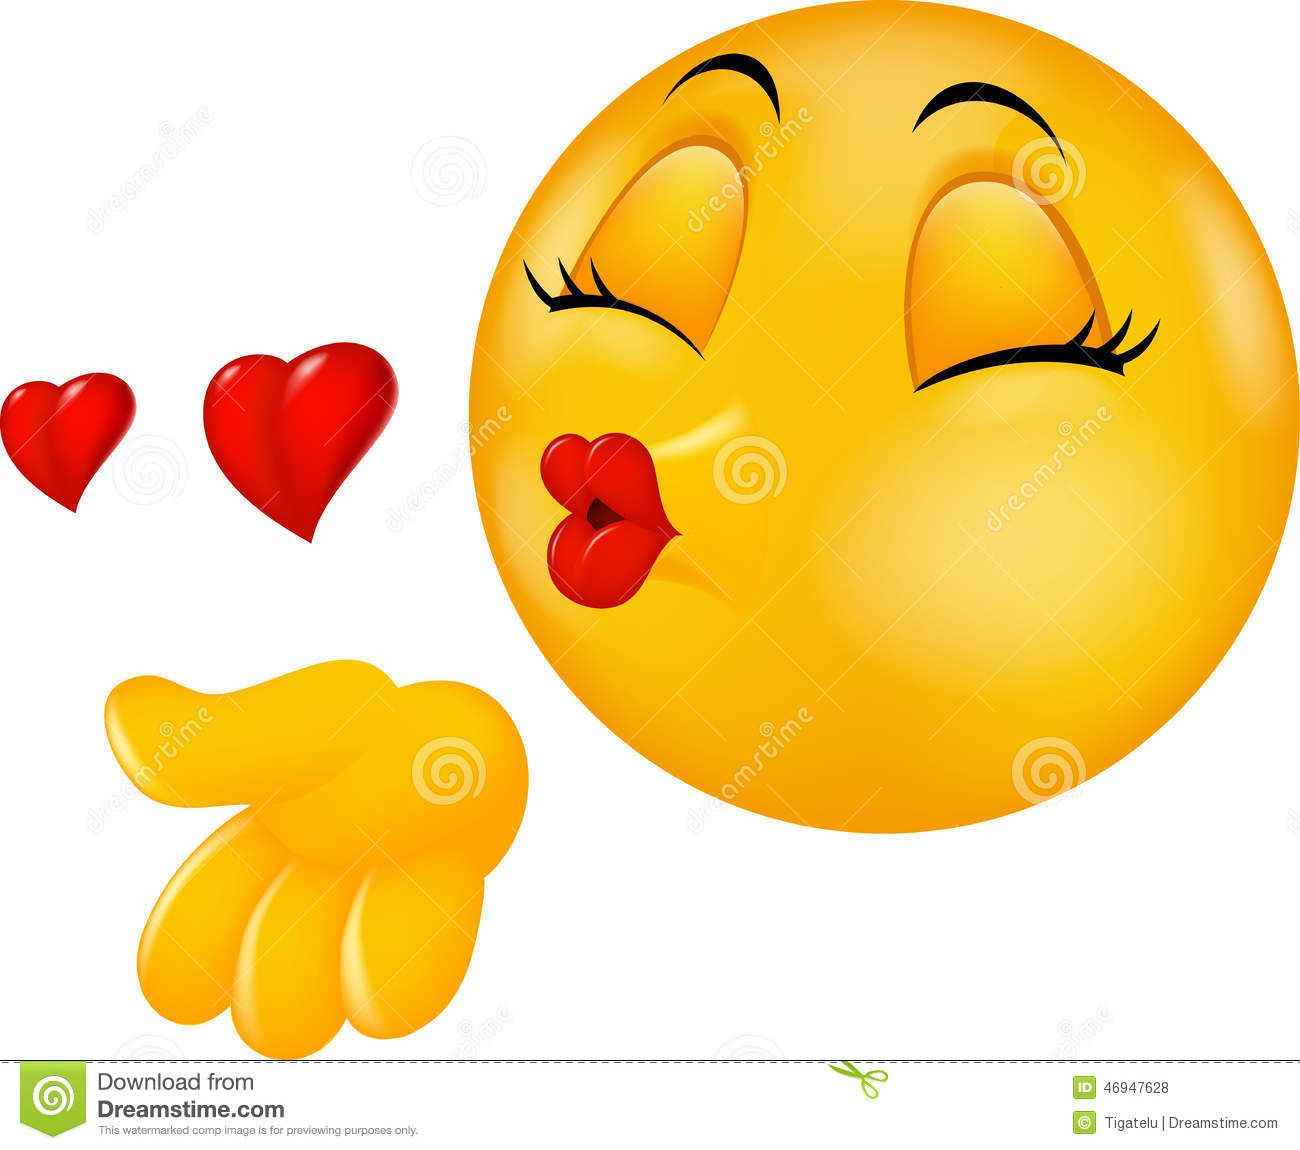 Kiss Emoticon Royalty Free Stock Image - Image: 14654286 ...